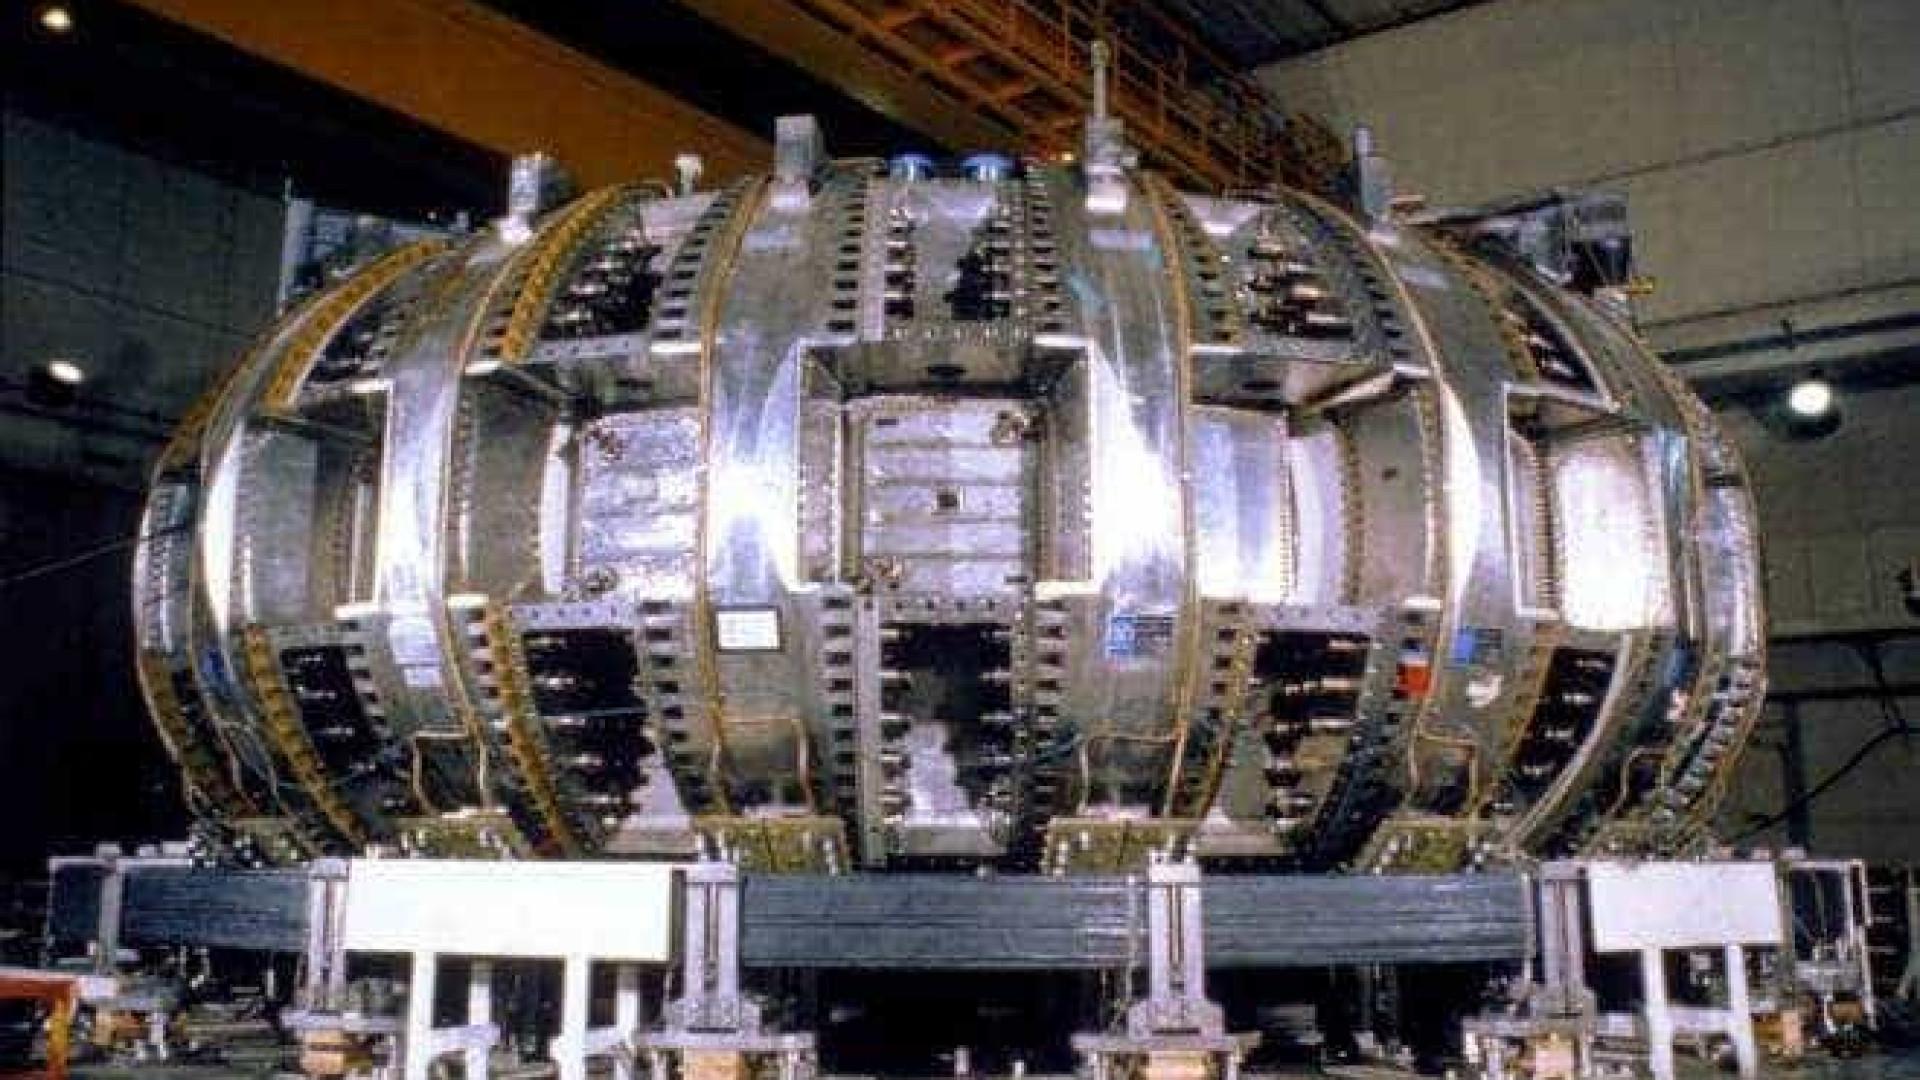 Nova teoria pode resolver problemas futuros de energia